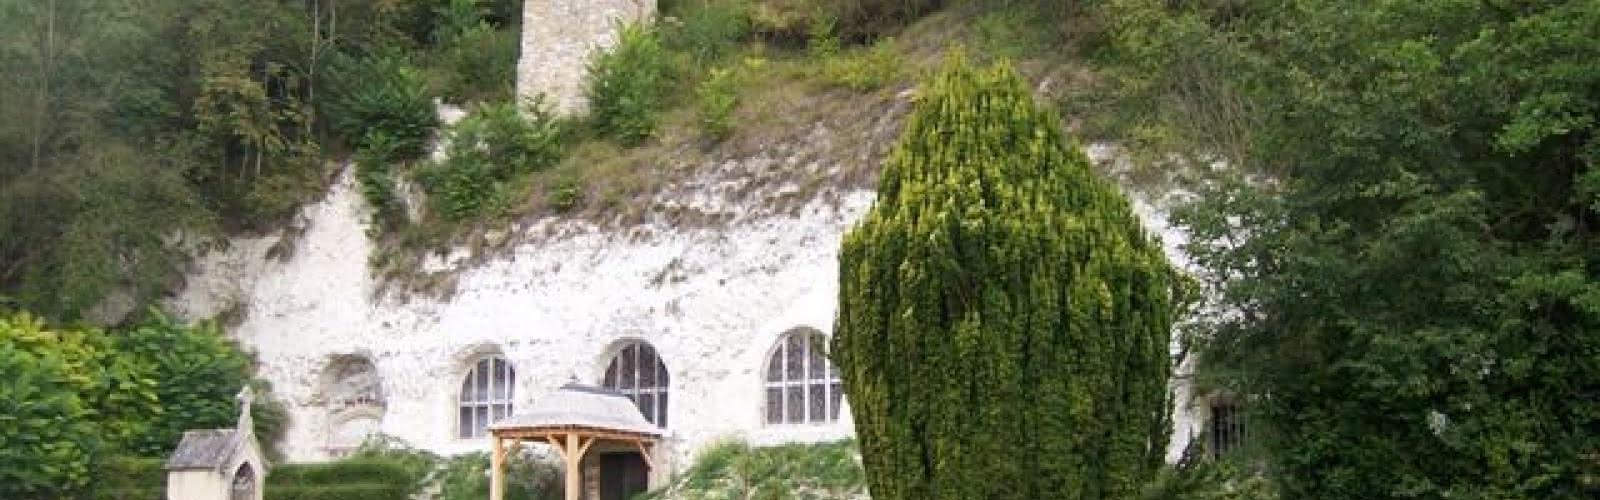 Eglise trogloditique - Haute-Isle